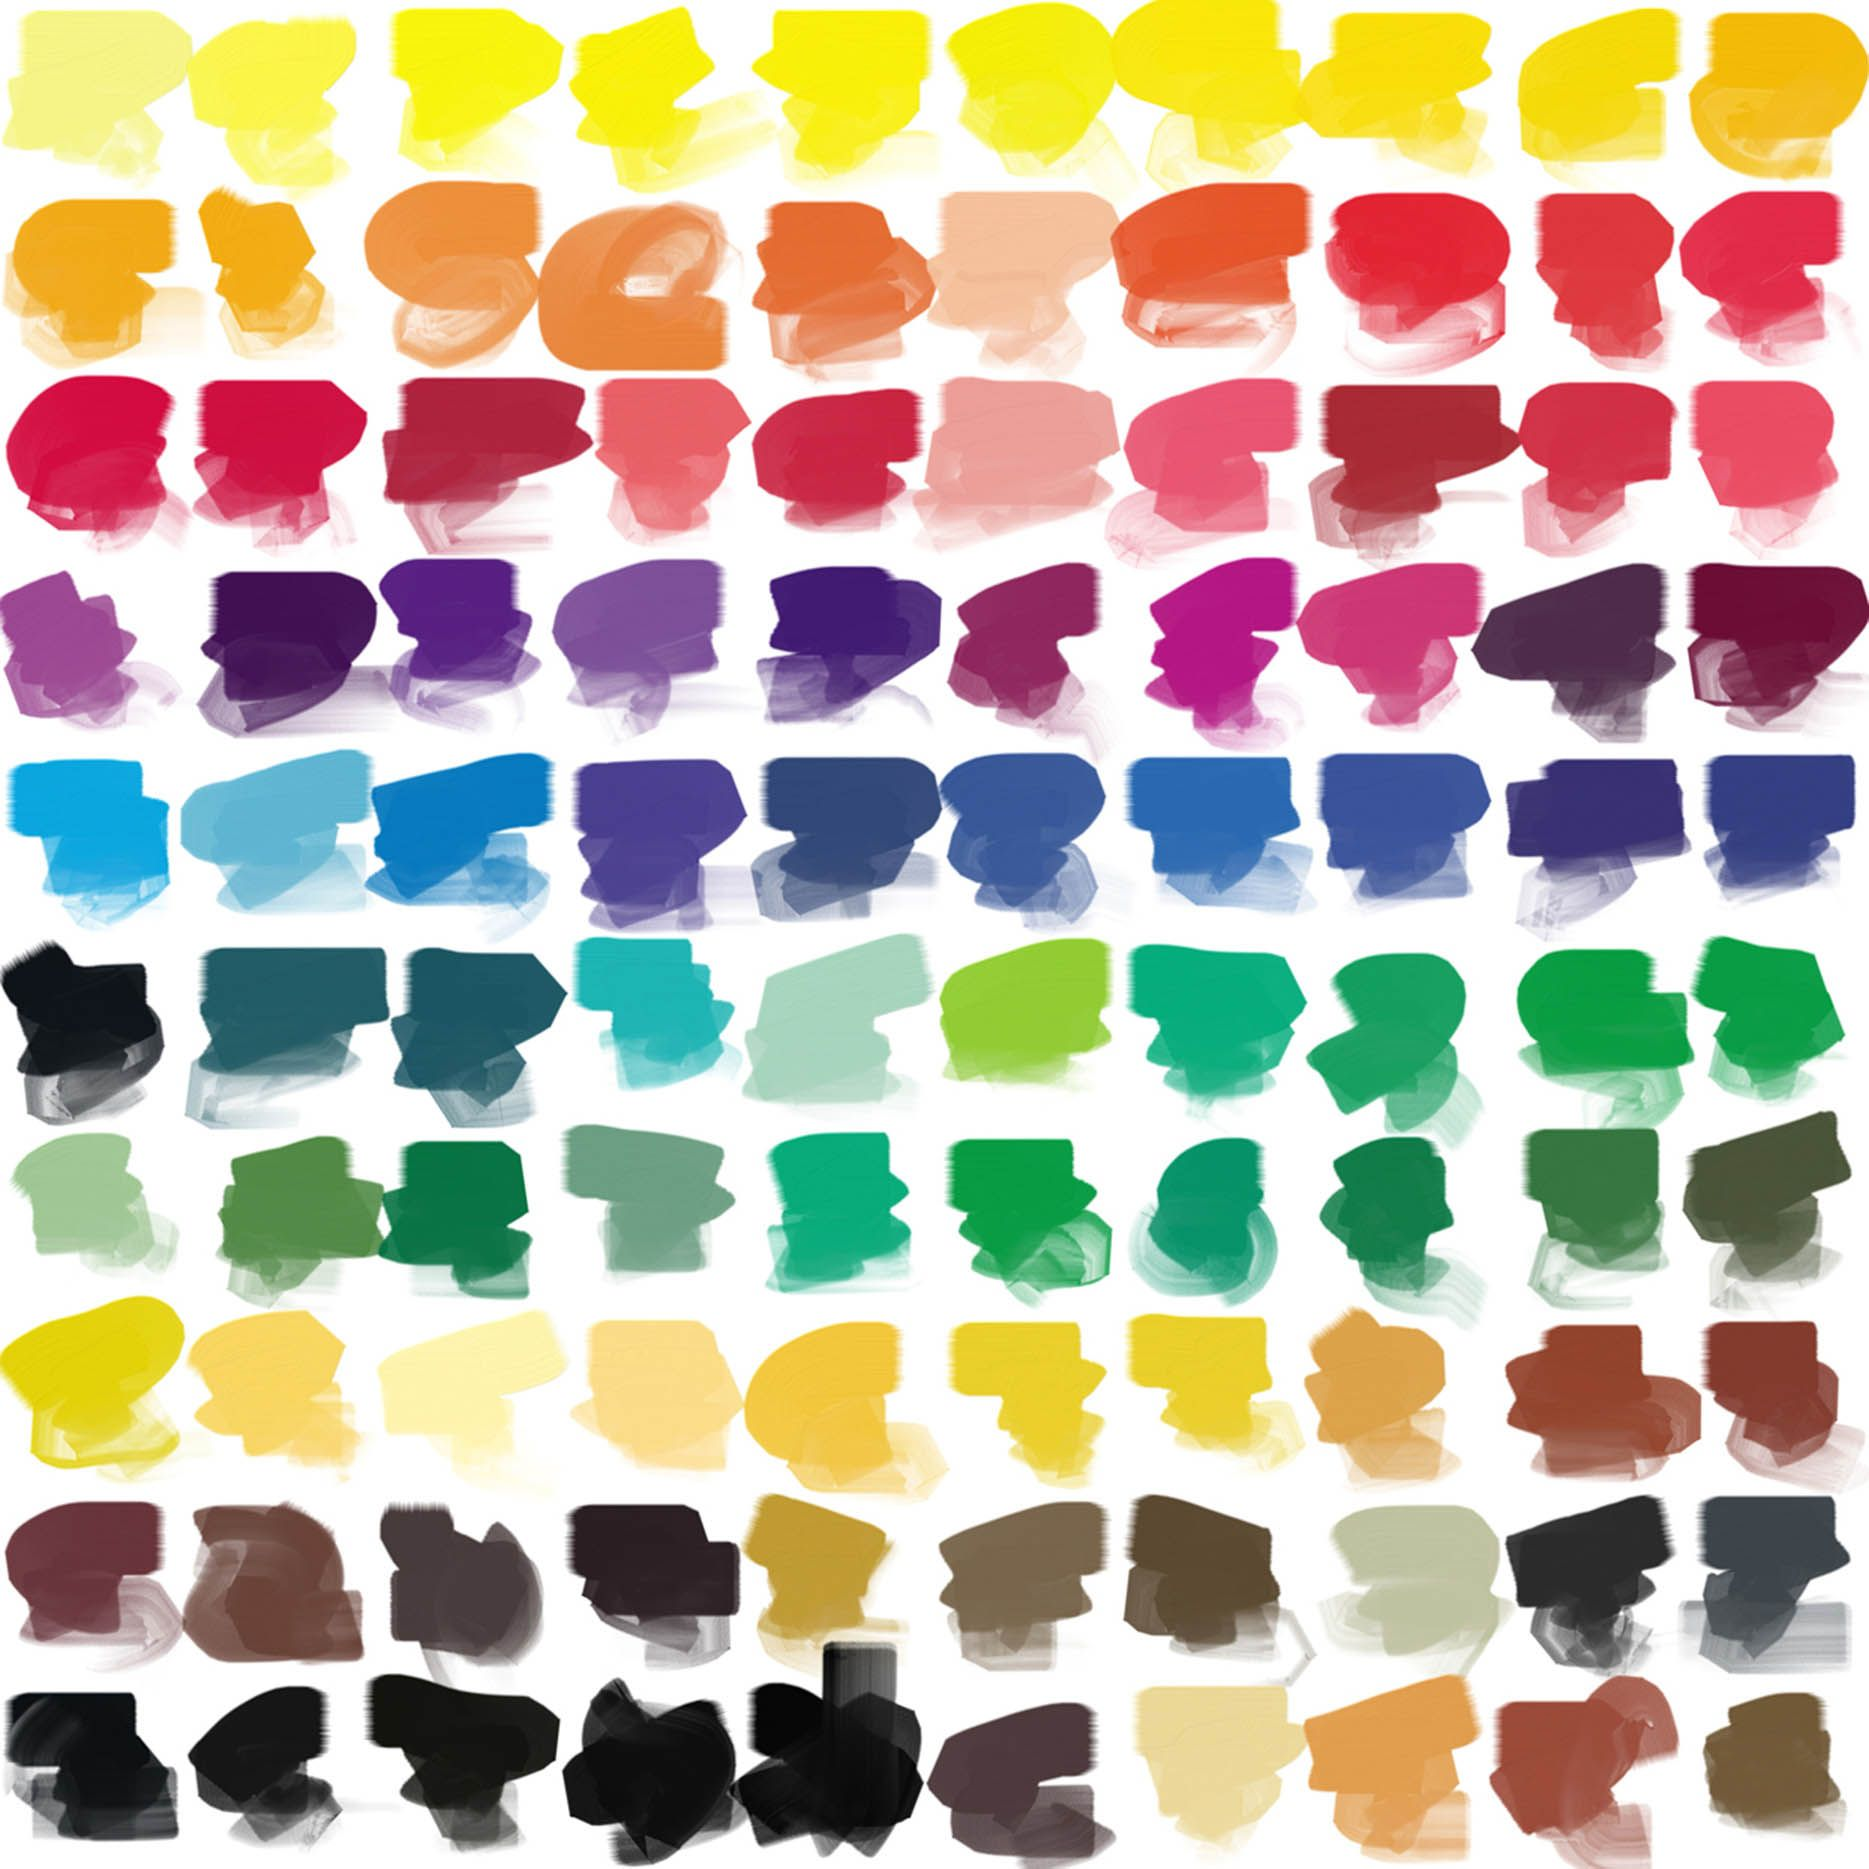 Paleta de colores en plastas de pintura 1869 - Paleta de pinturas ...